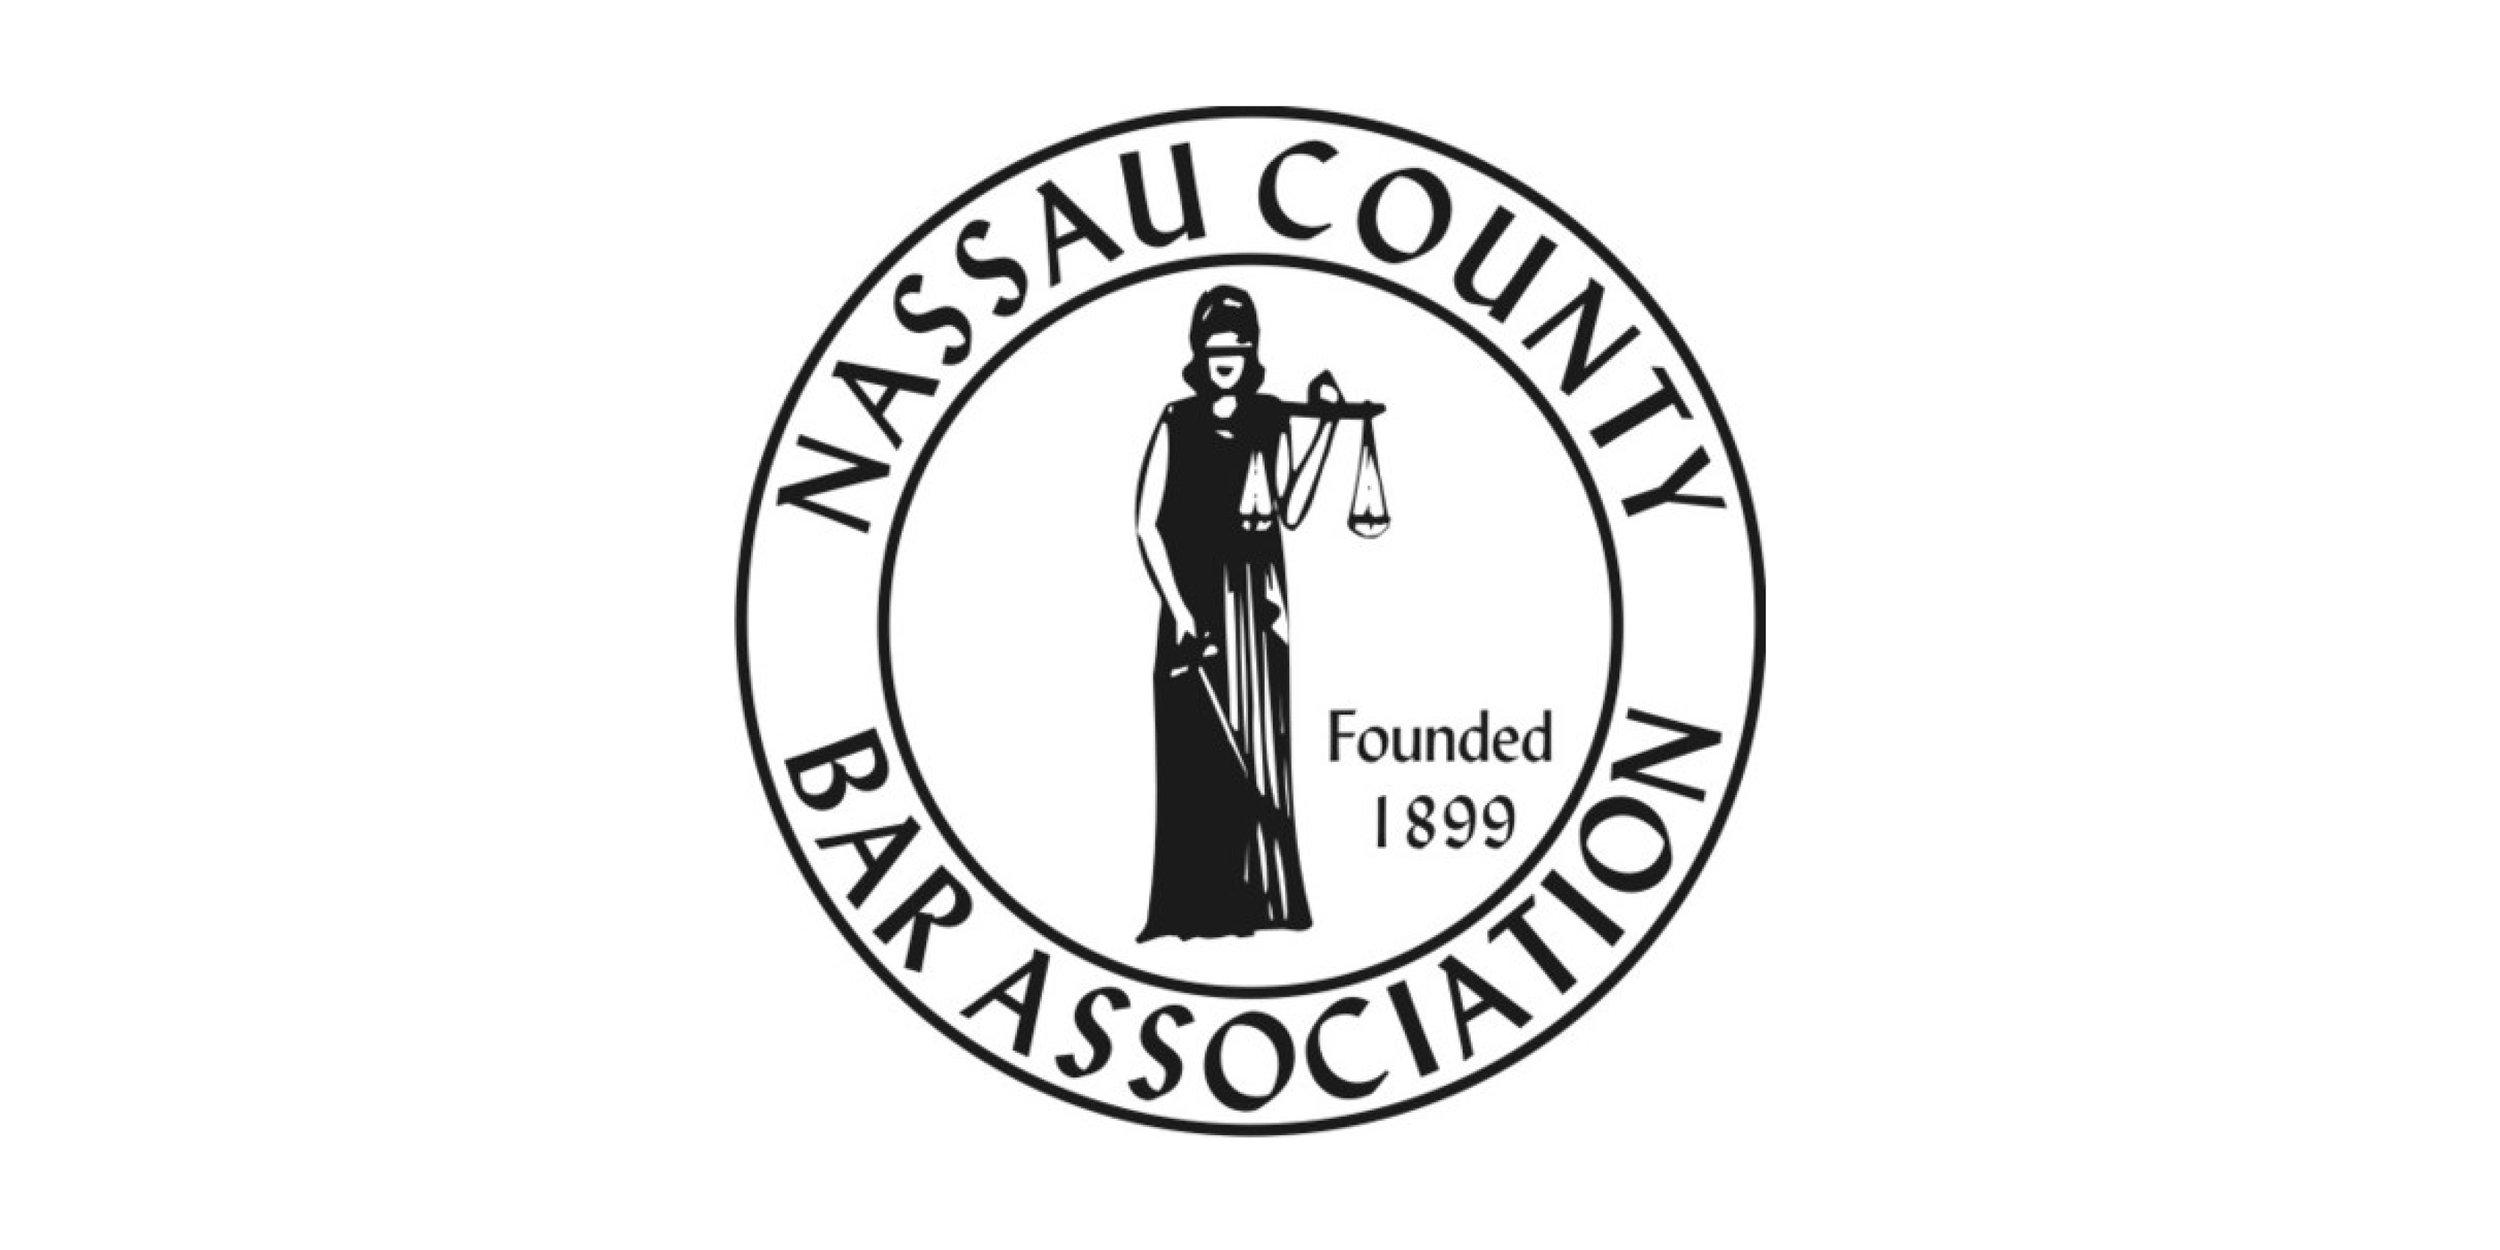 Law_Association_Logos.jpg